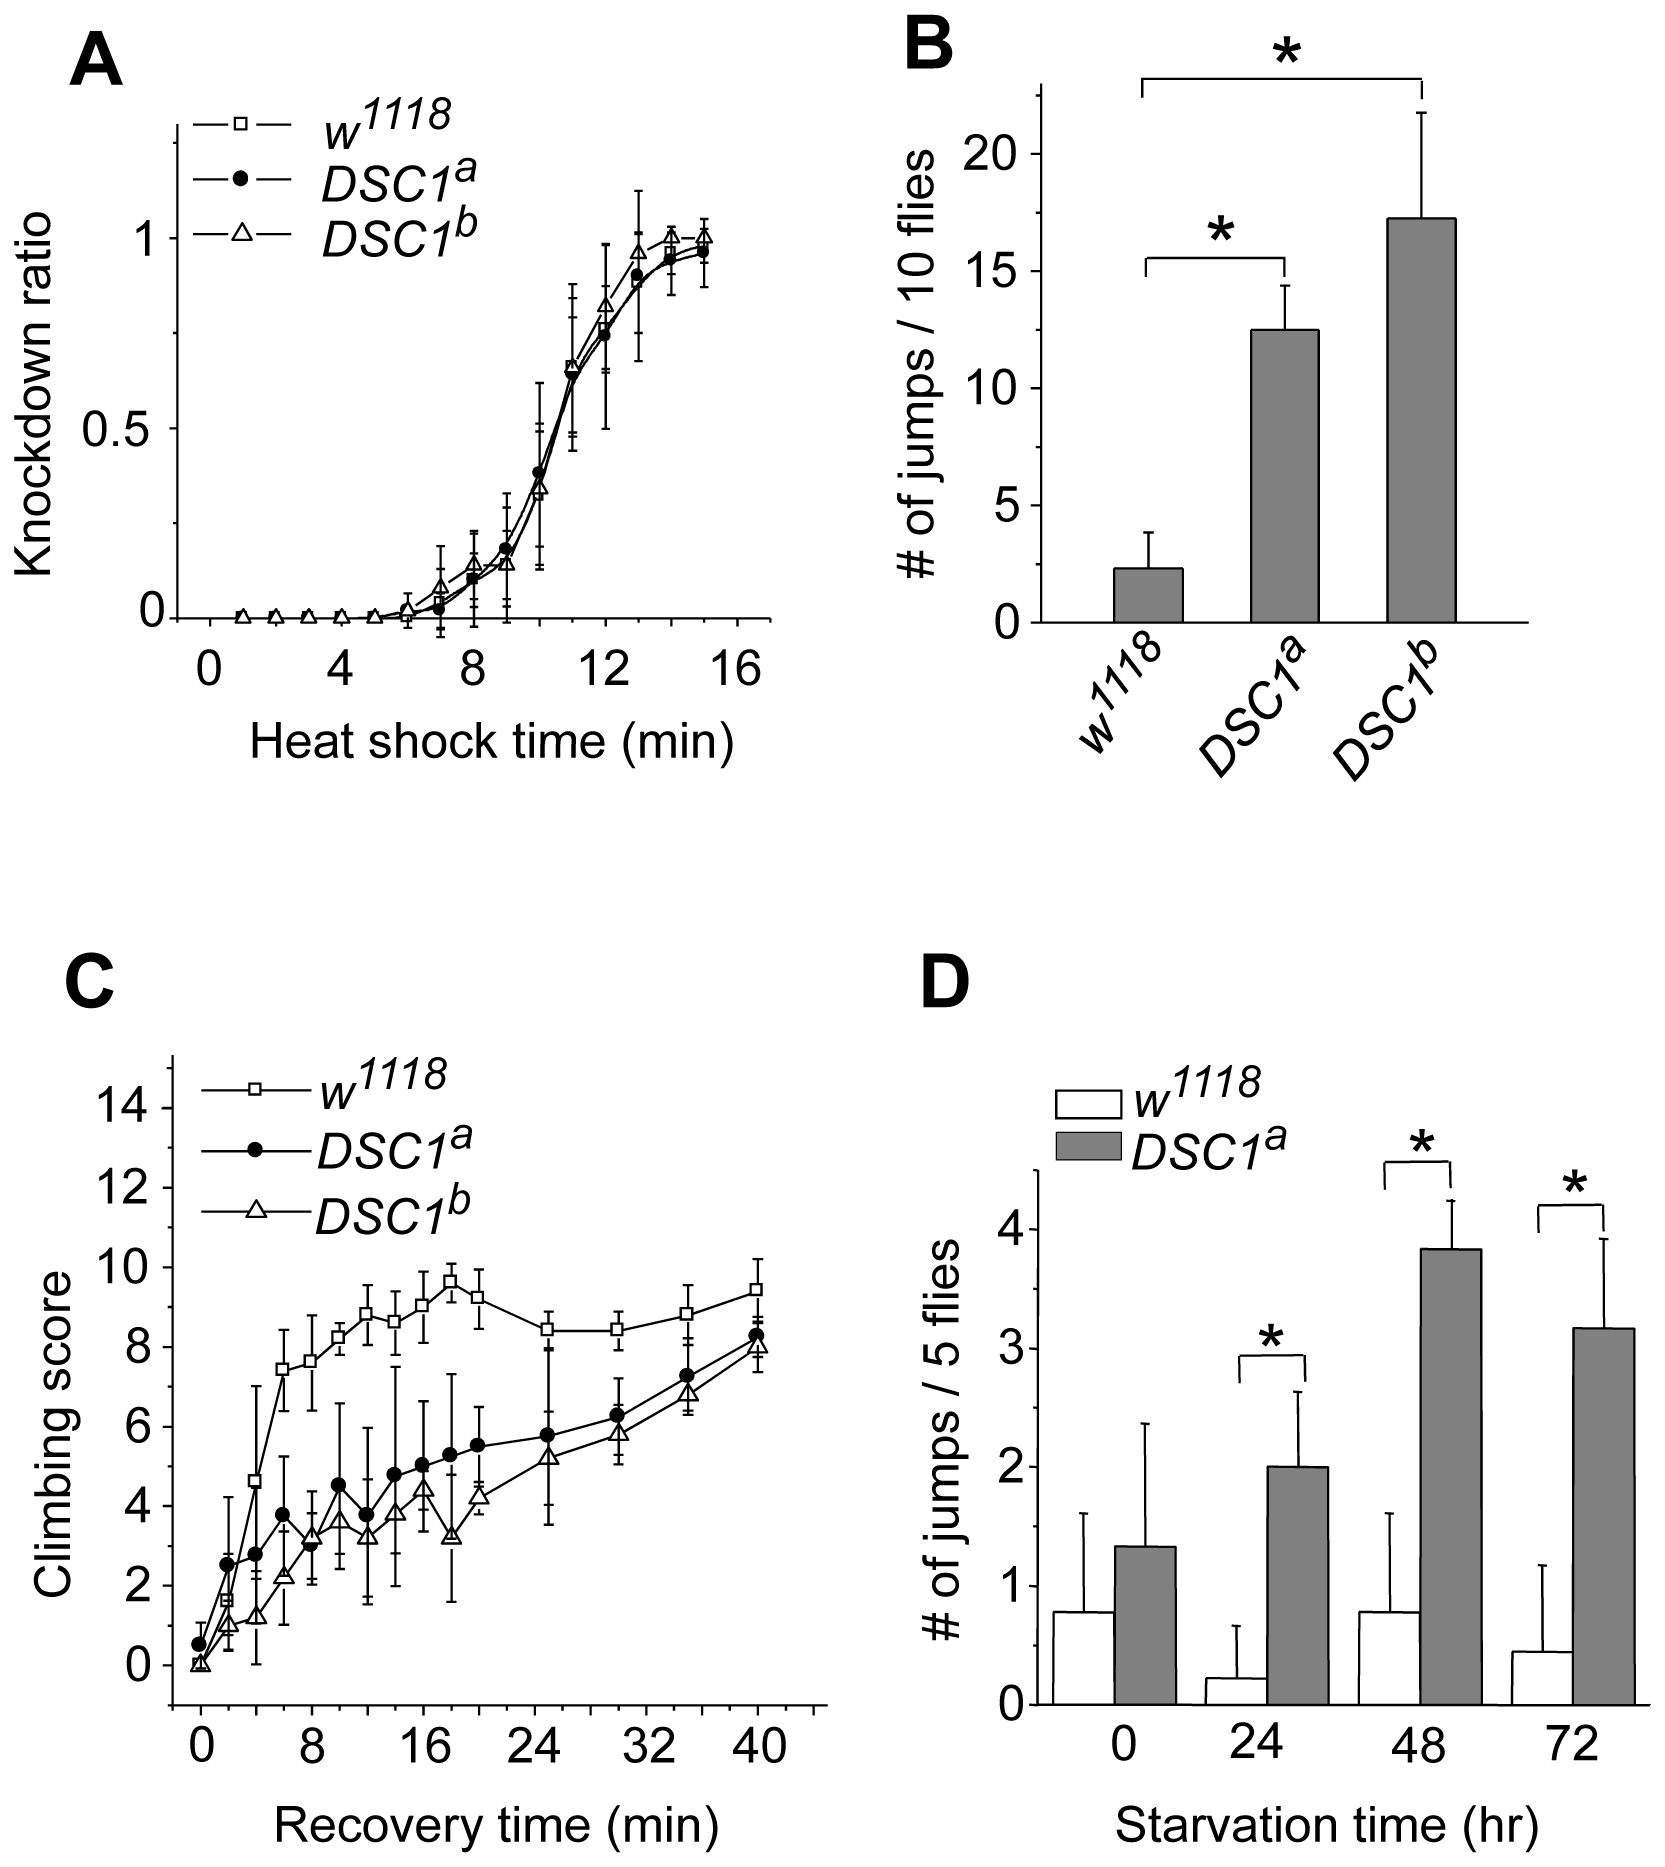 Behavioral characterization of <i>DSC1</i> knockout mutants.